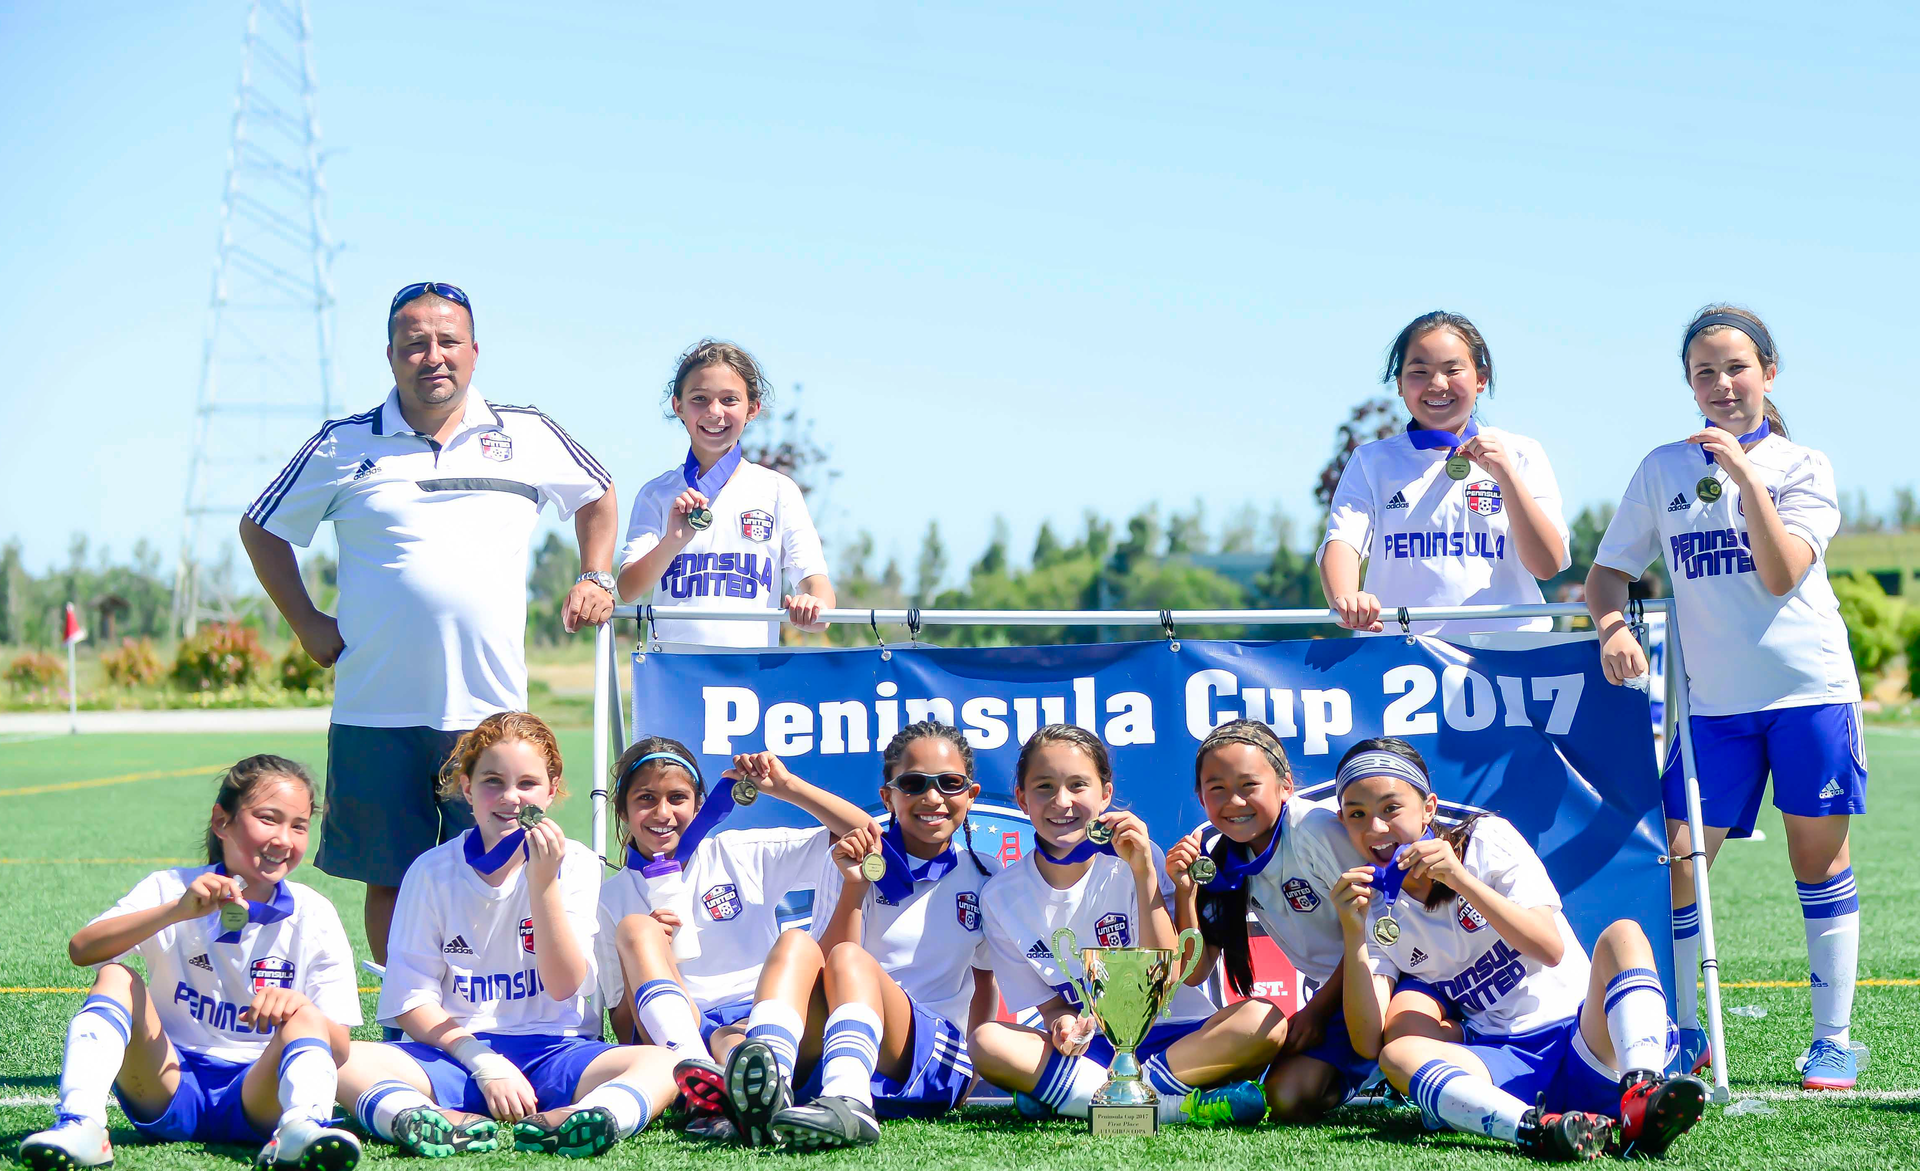 Peninsula Cup Winners